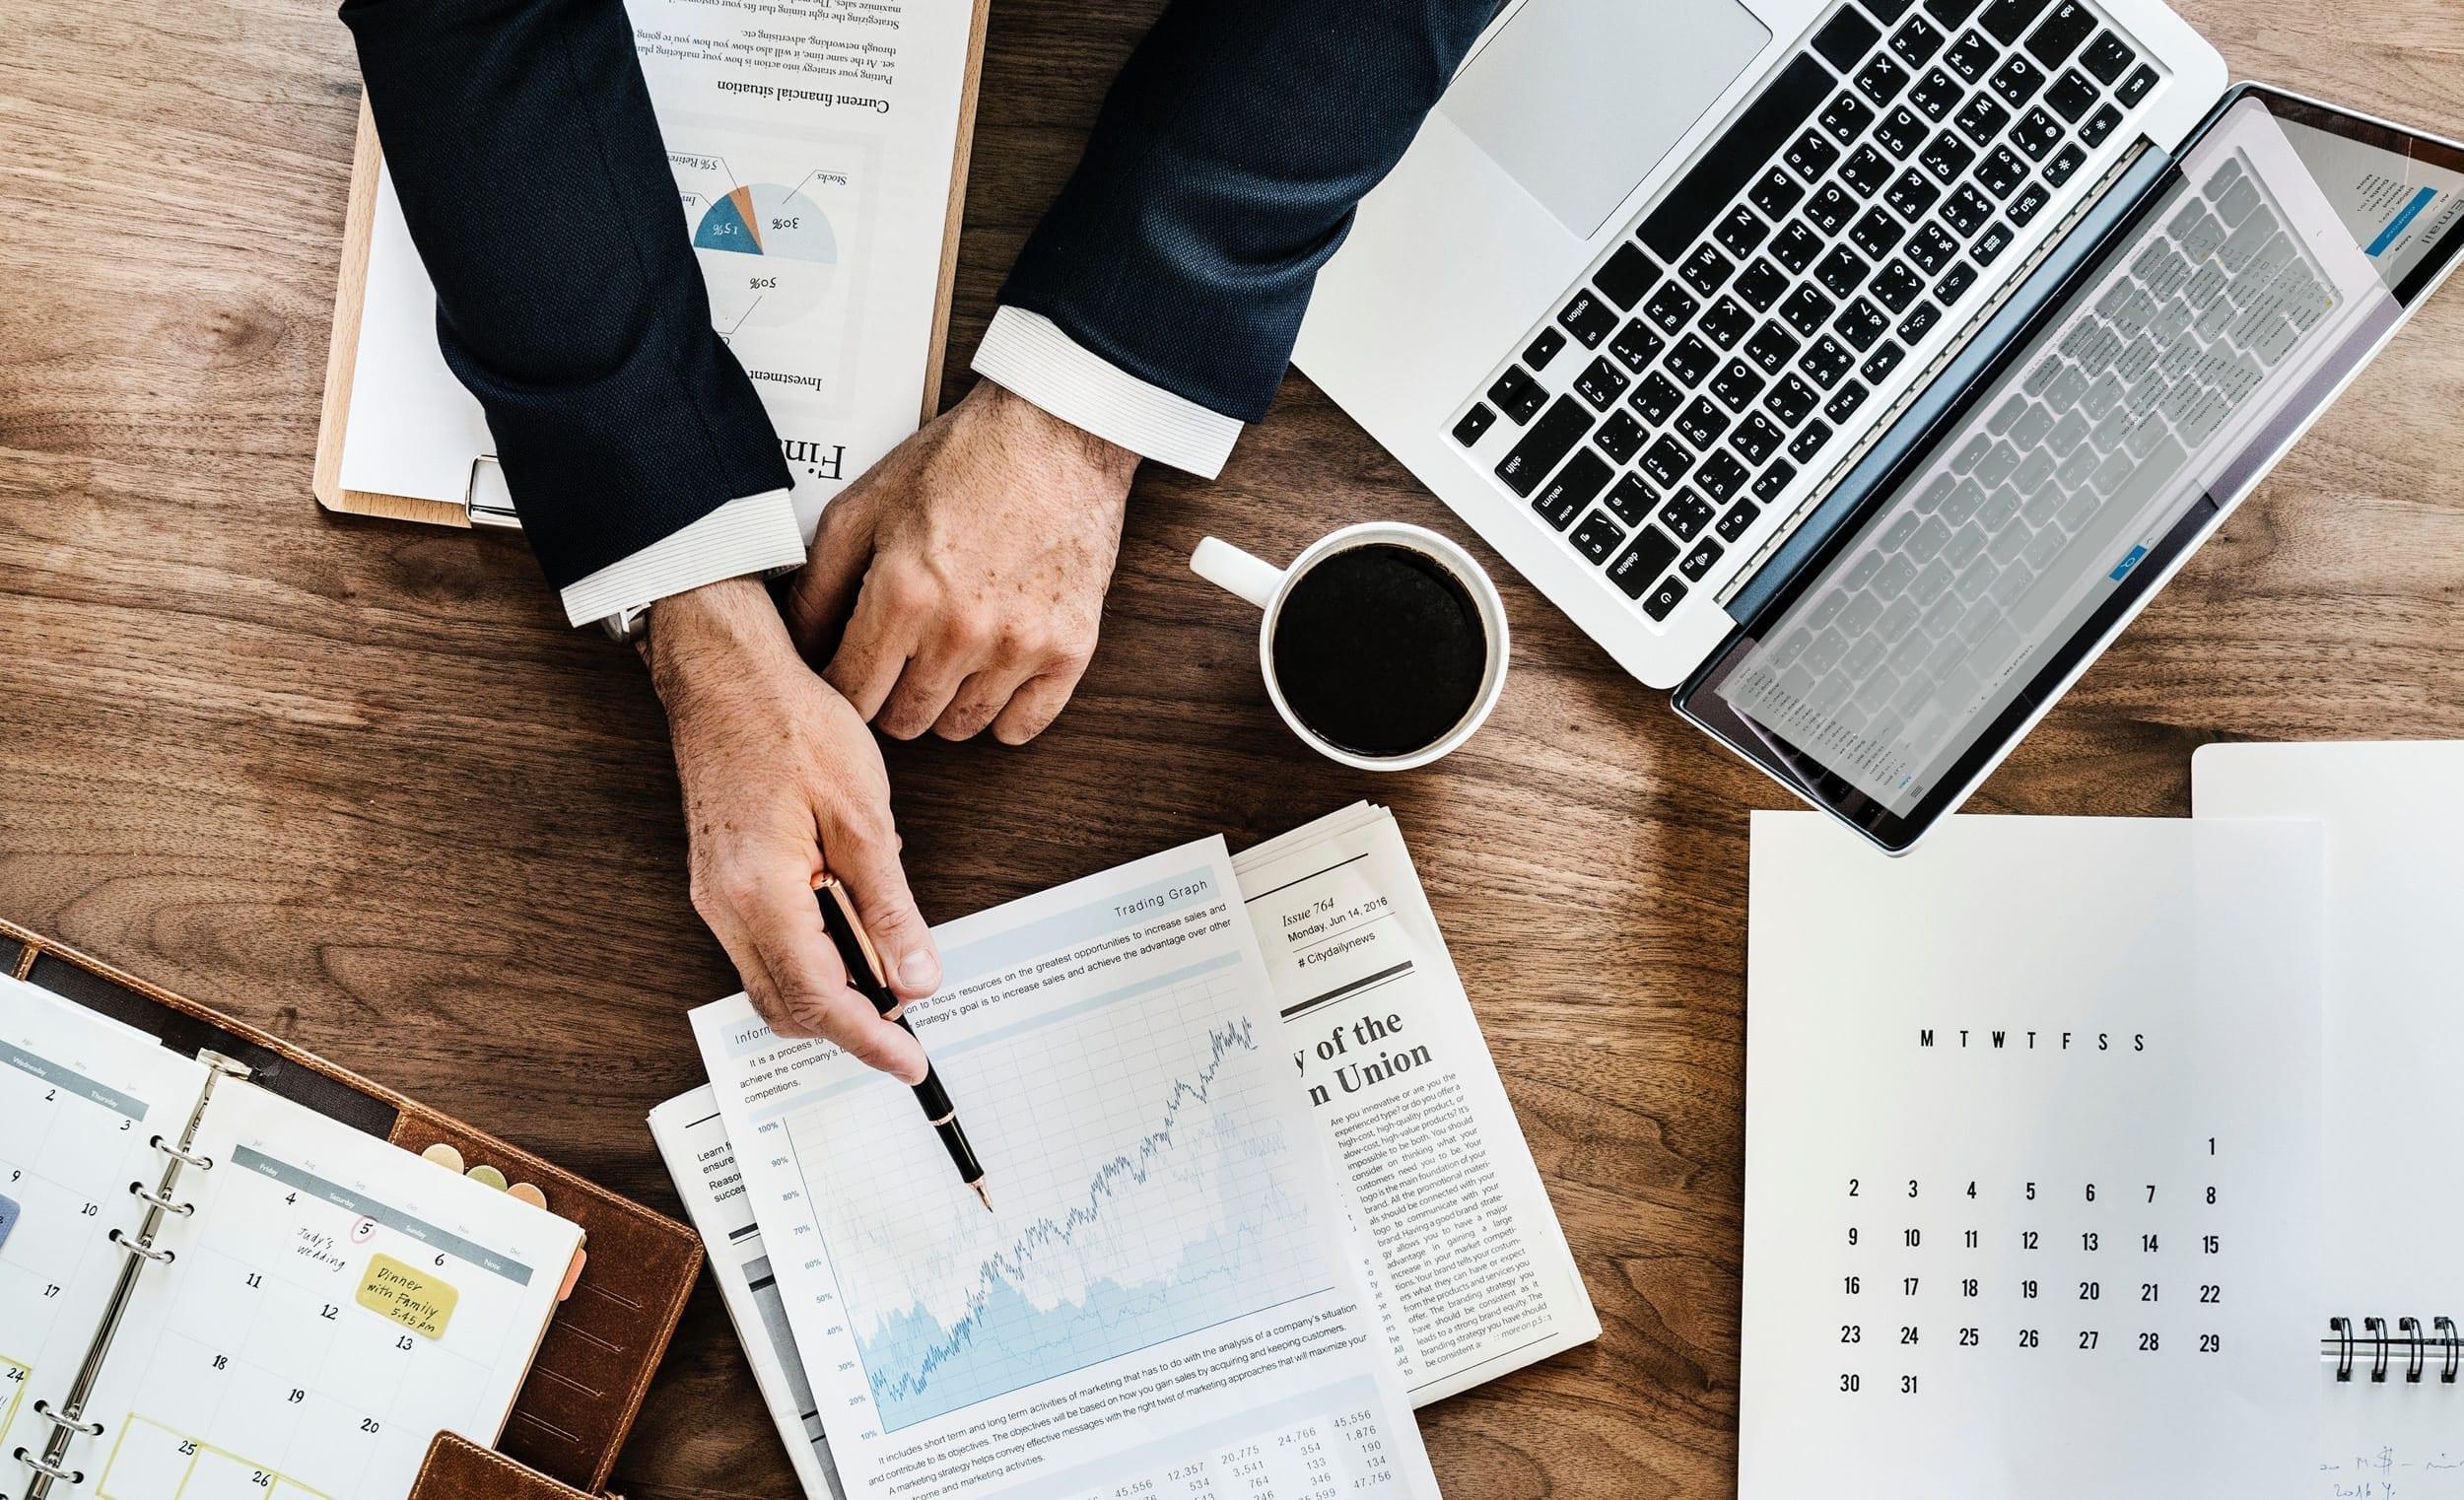 crowdfunding business plan